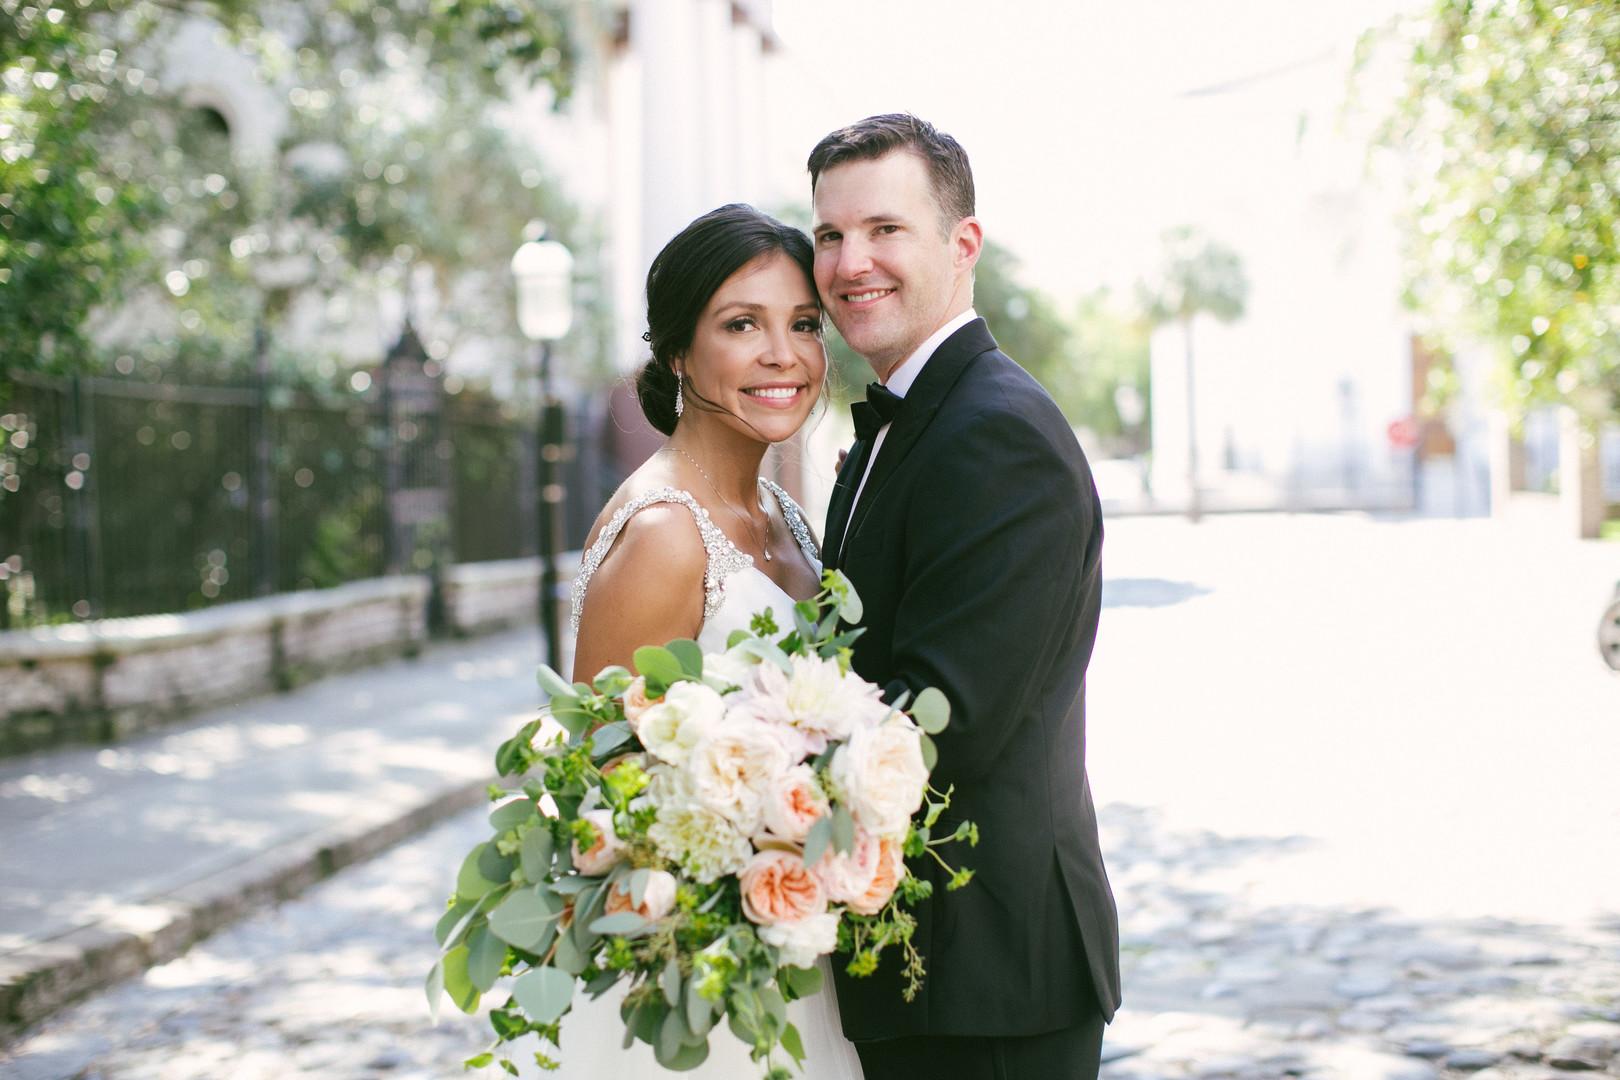 cedar-room-wedding-1.jpg